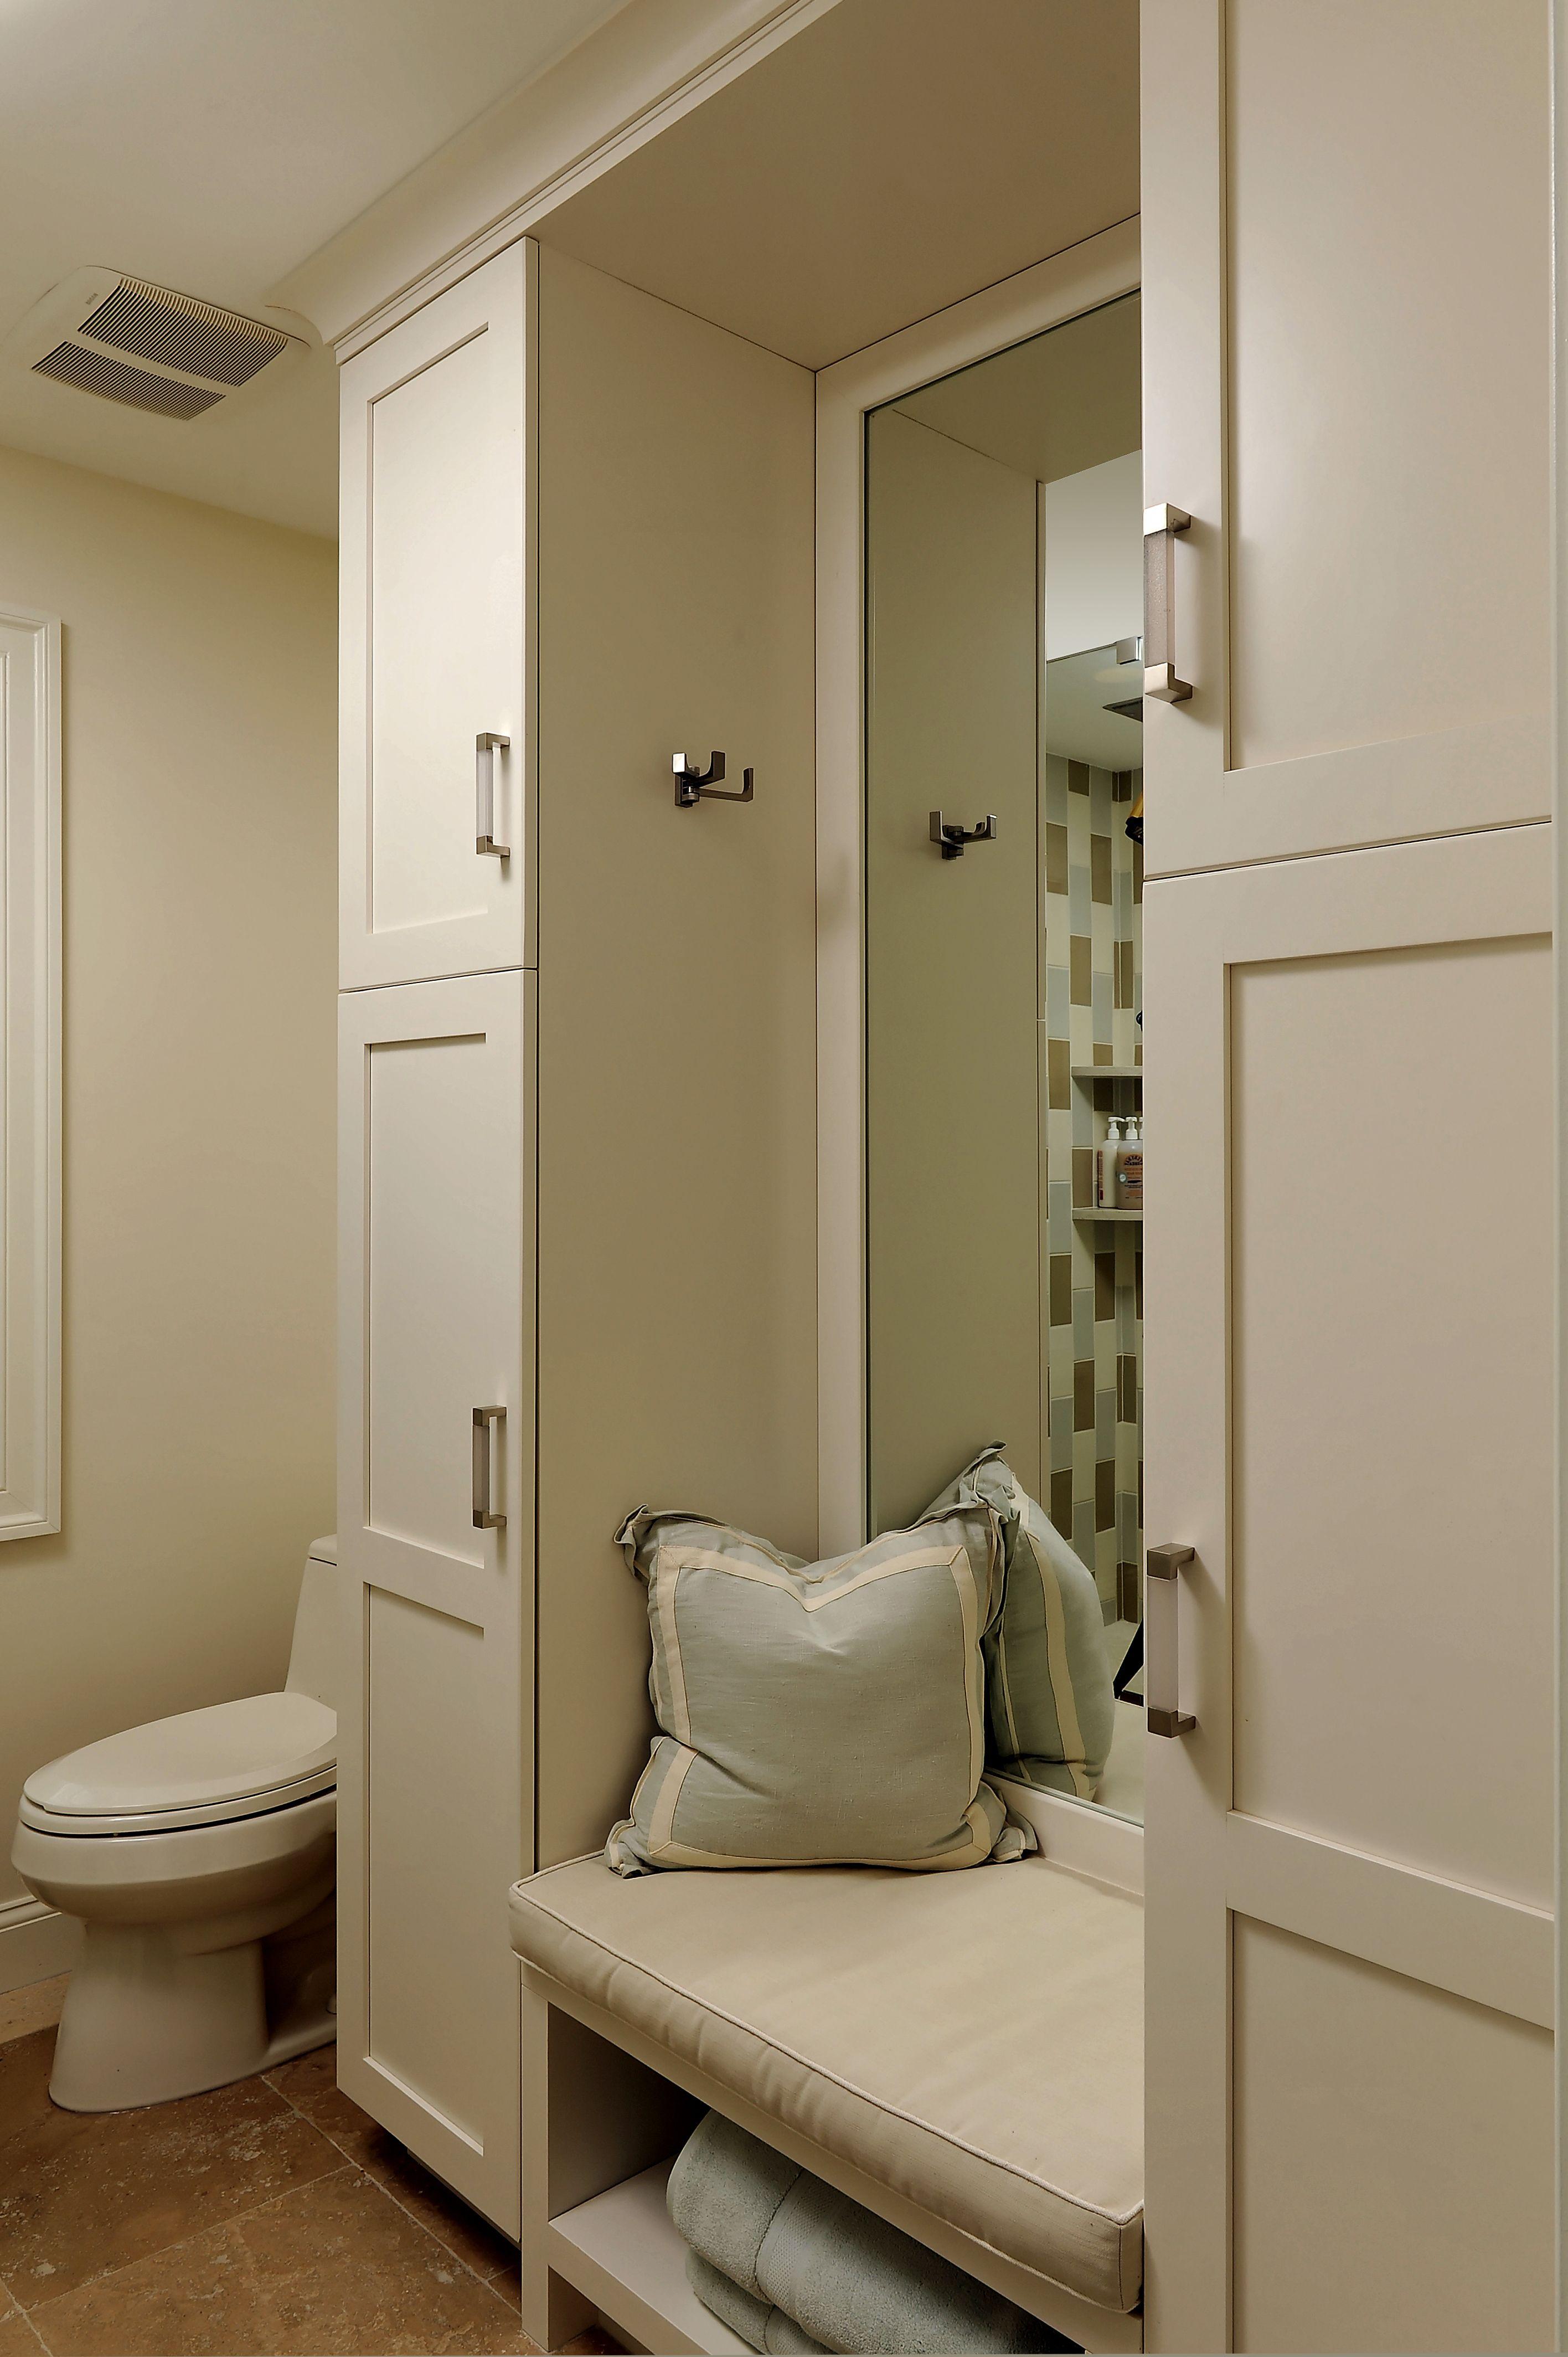 Pool House Bathroom Ideas Entrancing Pool House Bathroom  Exteriorskristin Peake Interiors Decorating Design